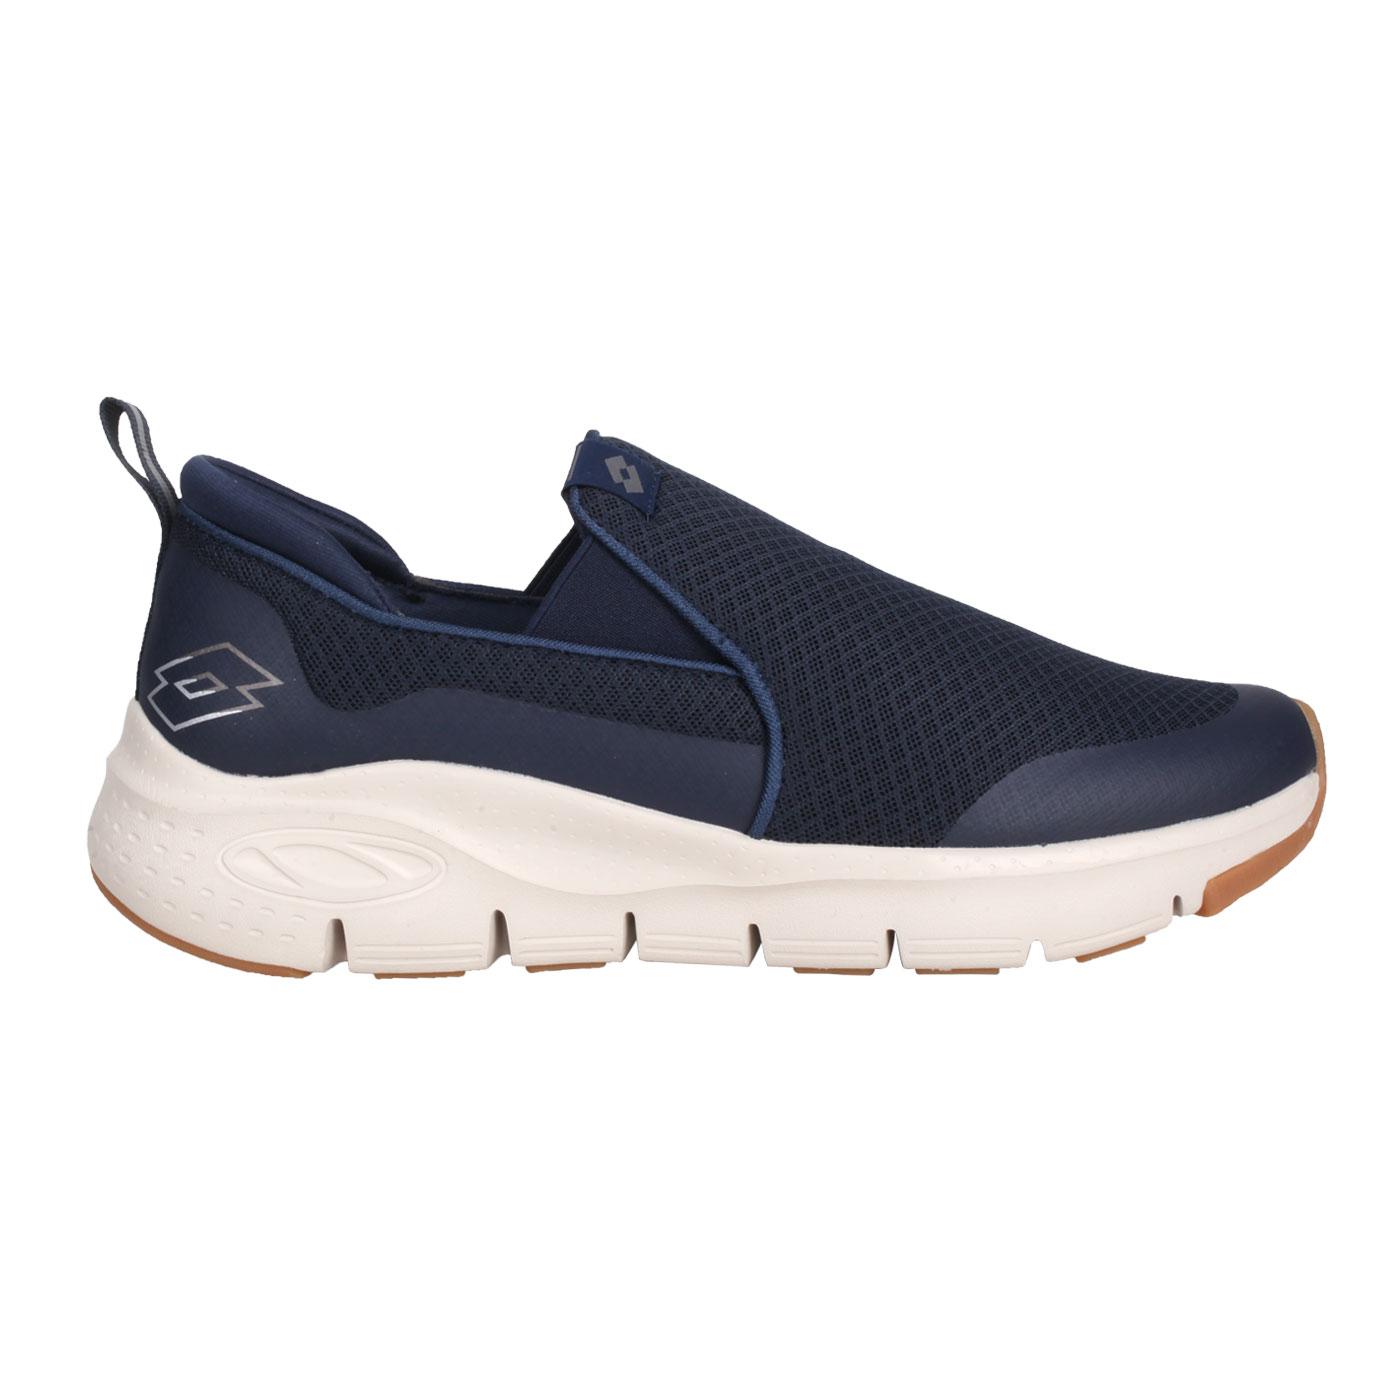 LOTTO 男款透氣健步鞋 LT1AMR3526 - 丈青銀